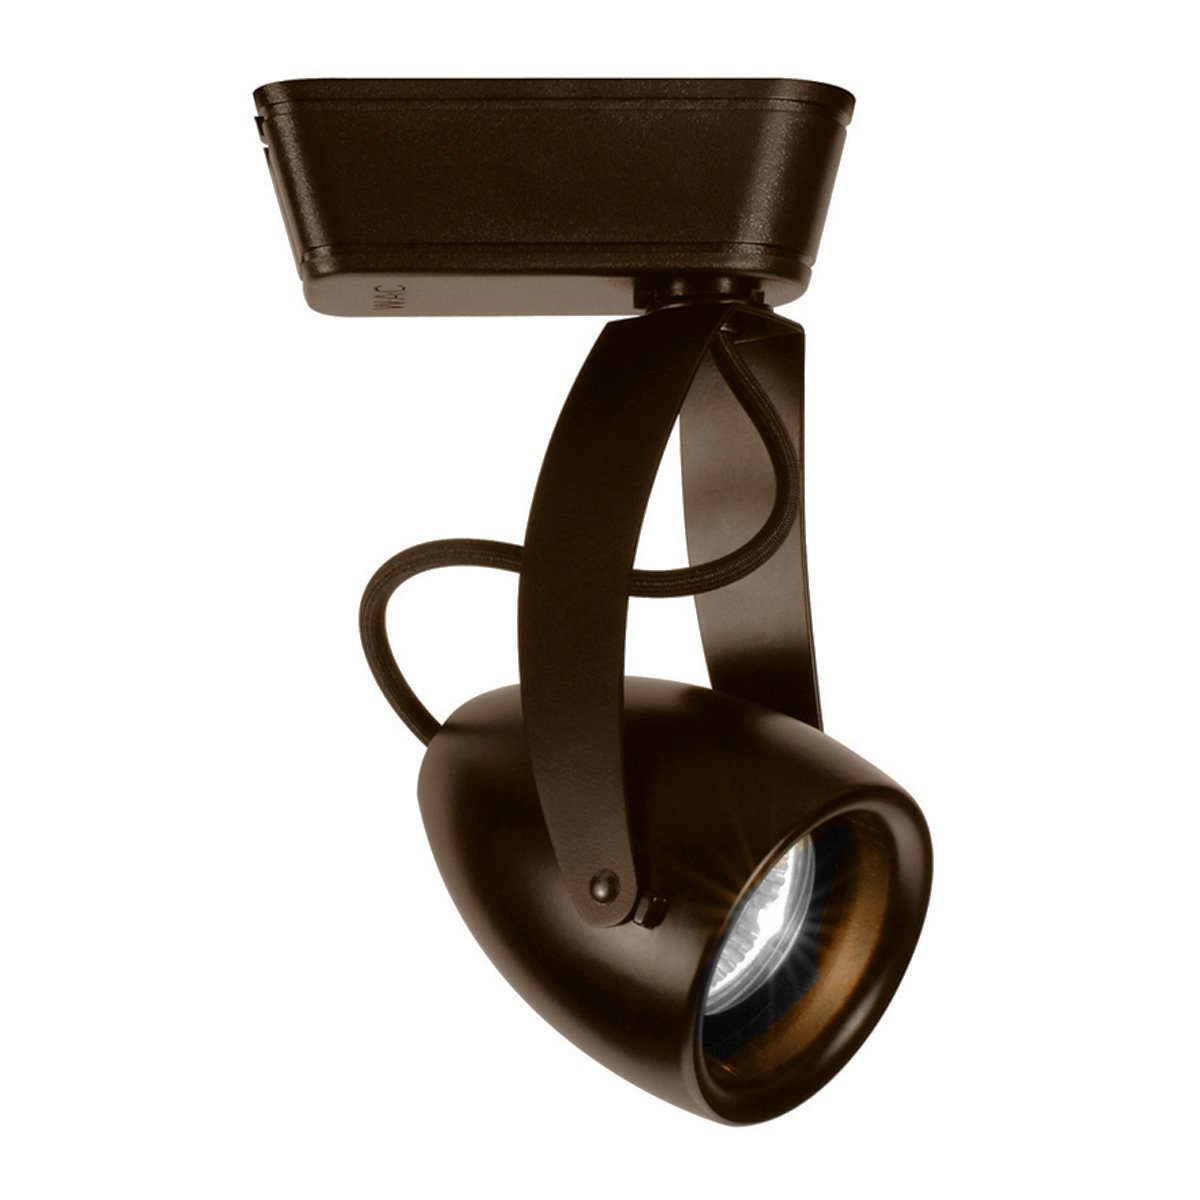 WAC Lighting J-LED810F-930-DB J Series LED810 Impulse LED Low Voltage Track Head in Dark Bronze Finish, Flood Beam, 90+CRI and 3000K